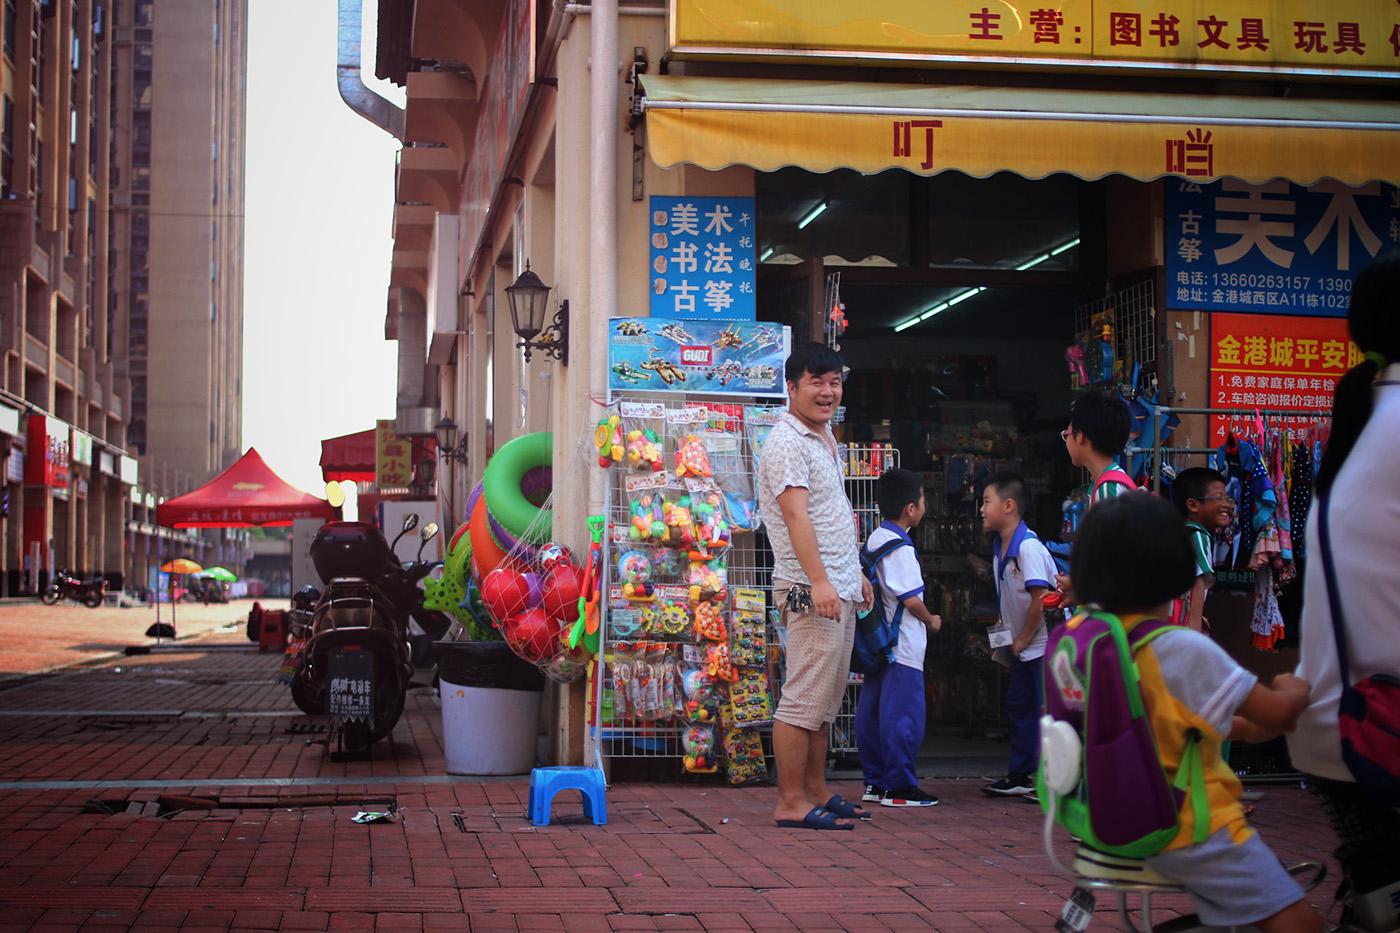 guangzhou china Travel photo colour city